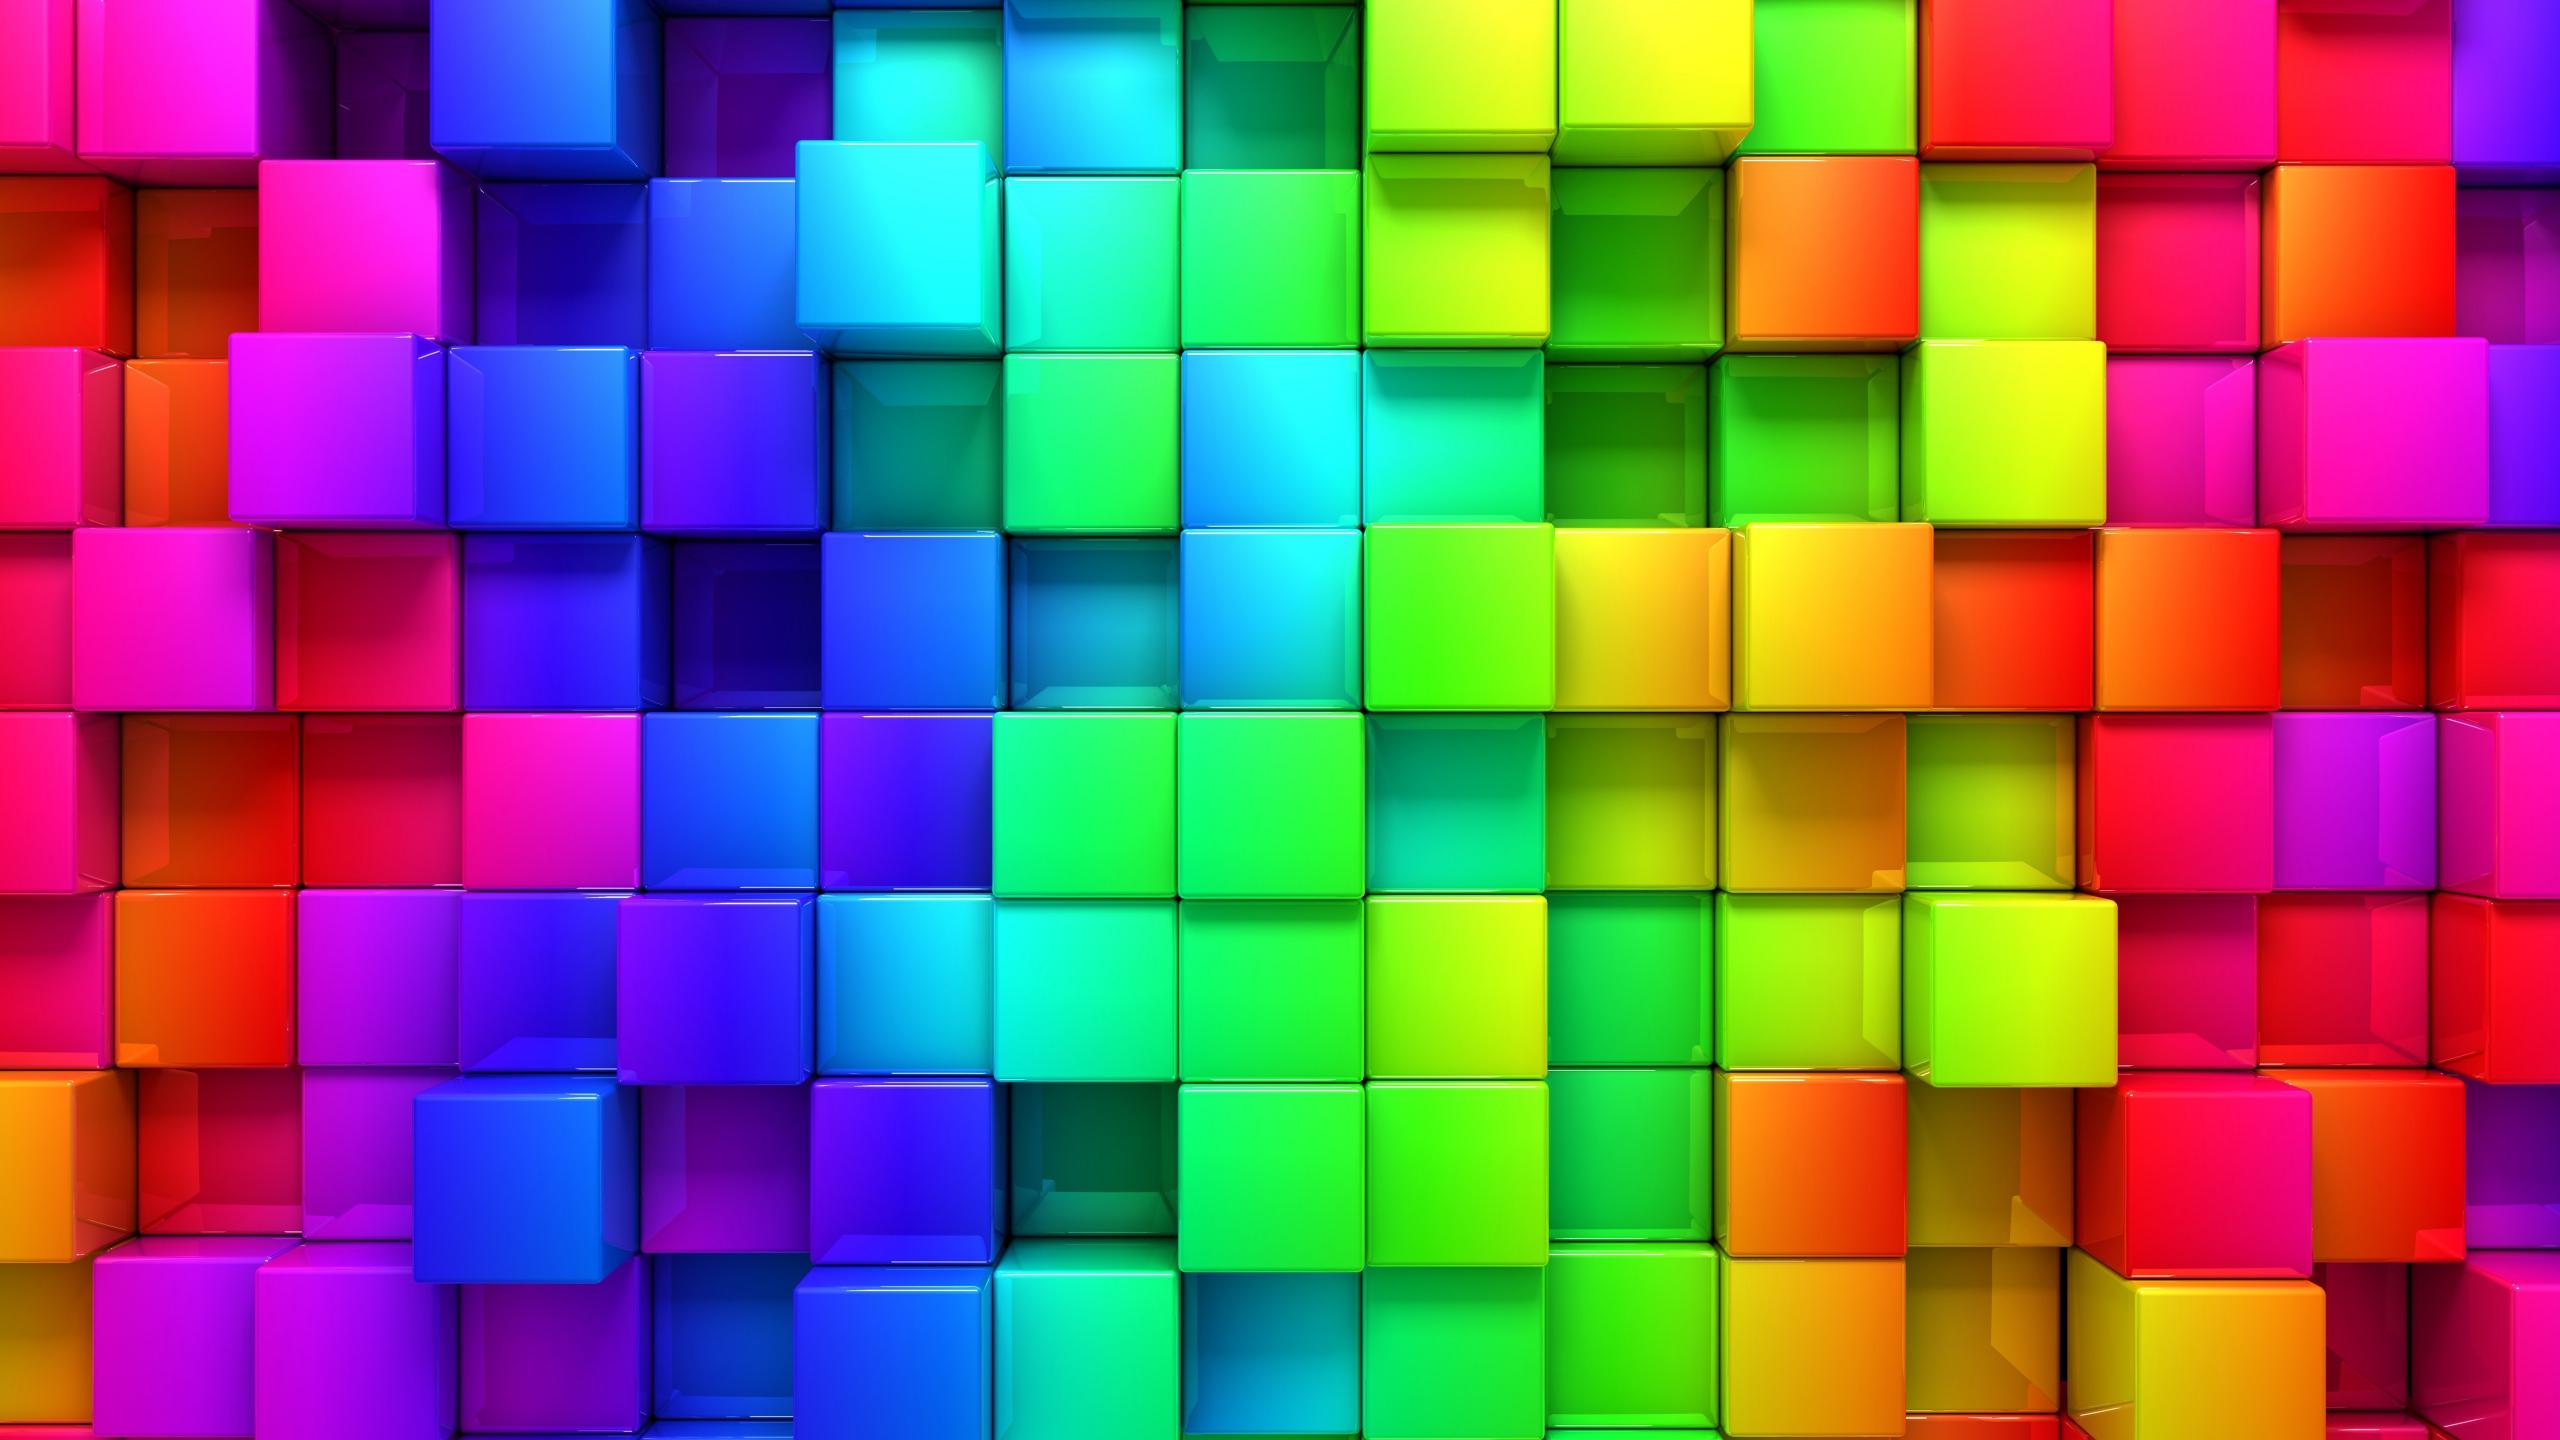 2560x1440 Wallpaper blocks rainbow 3d graphics background 2560x1440